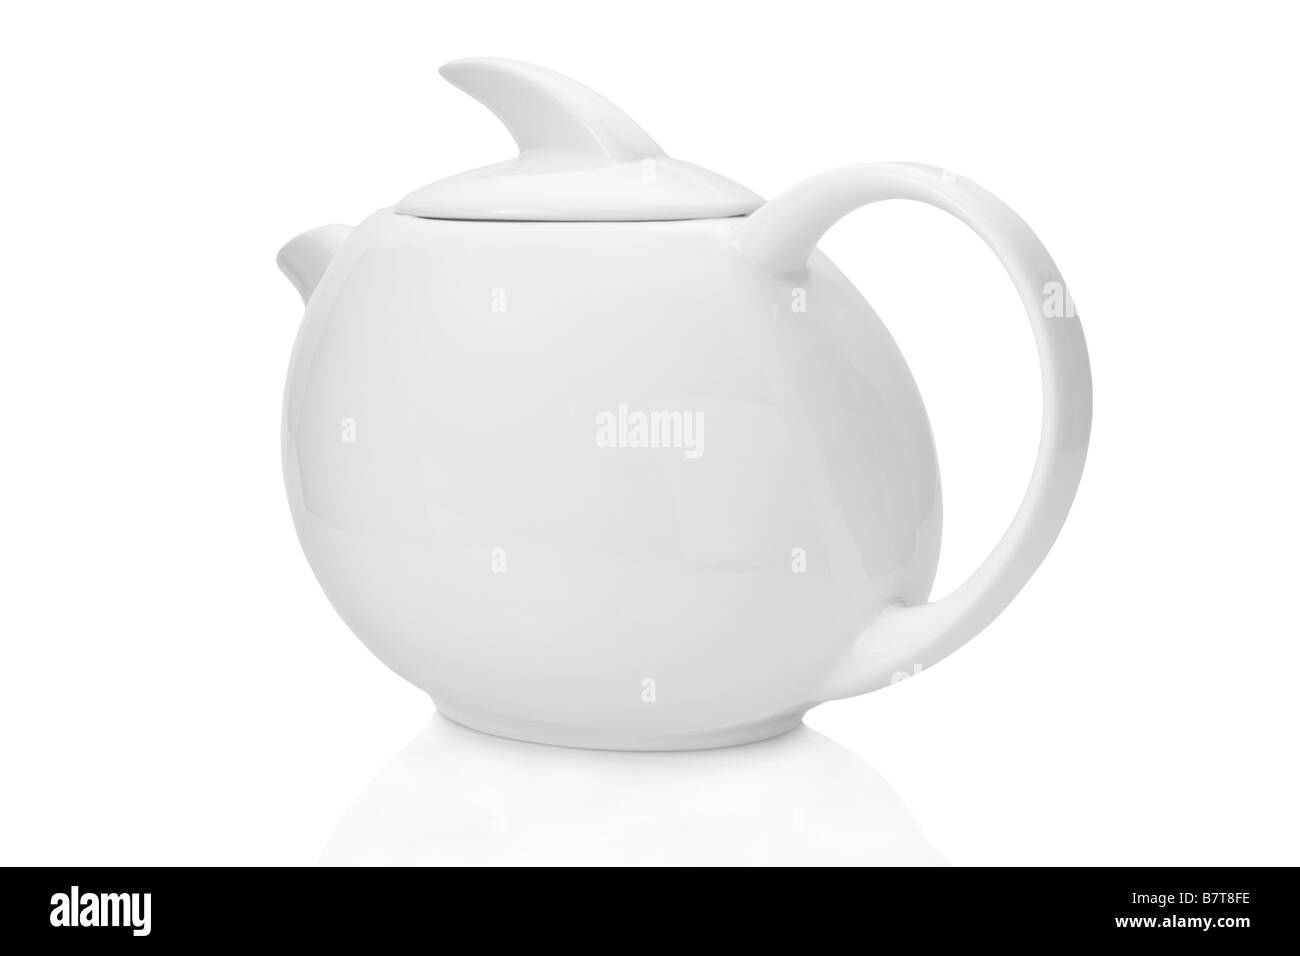 White tea pot isolated on white background - Stock Image